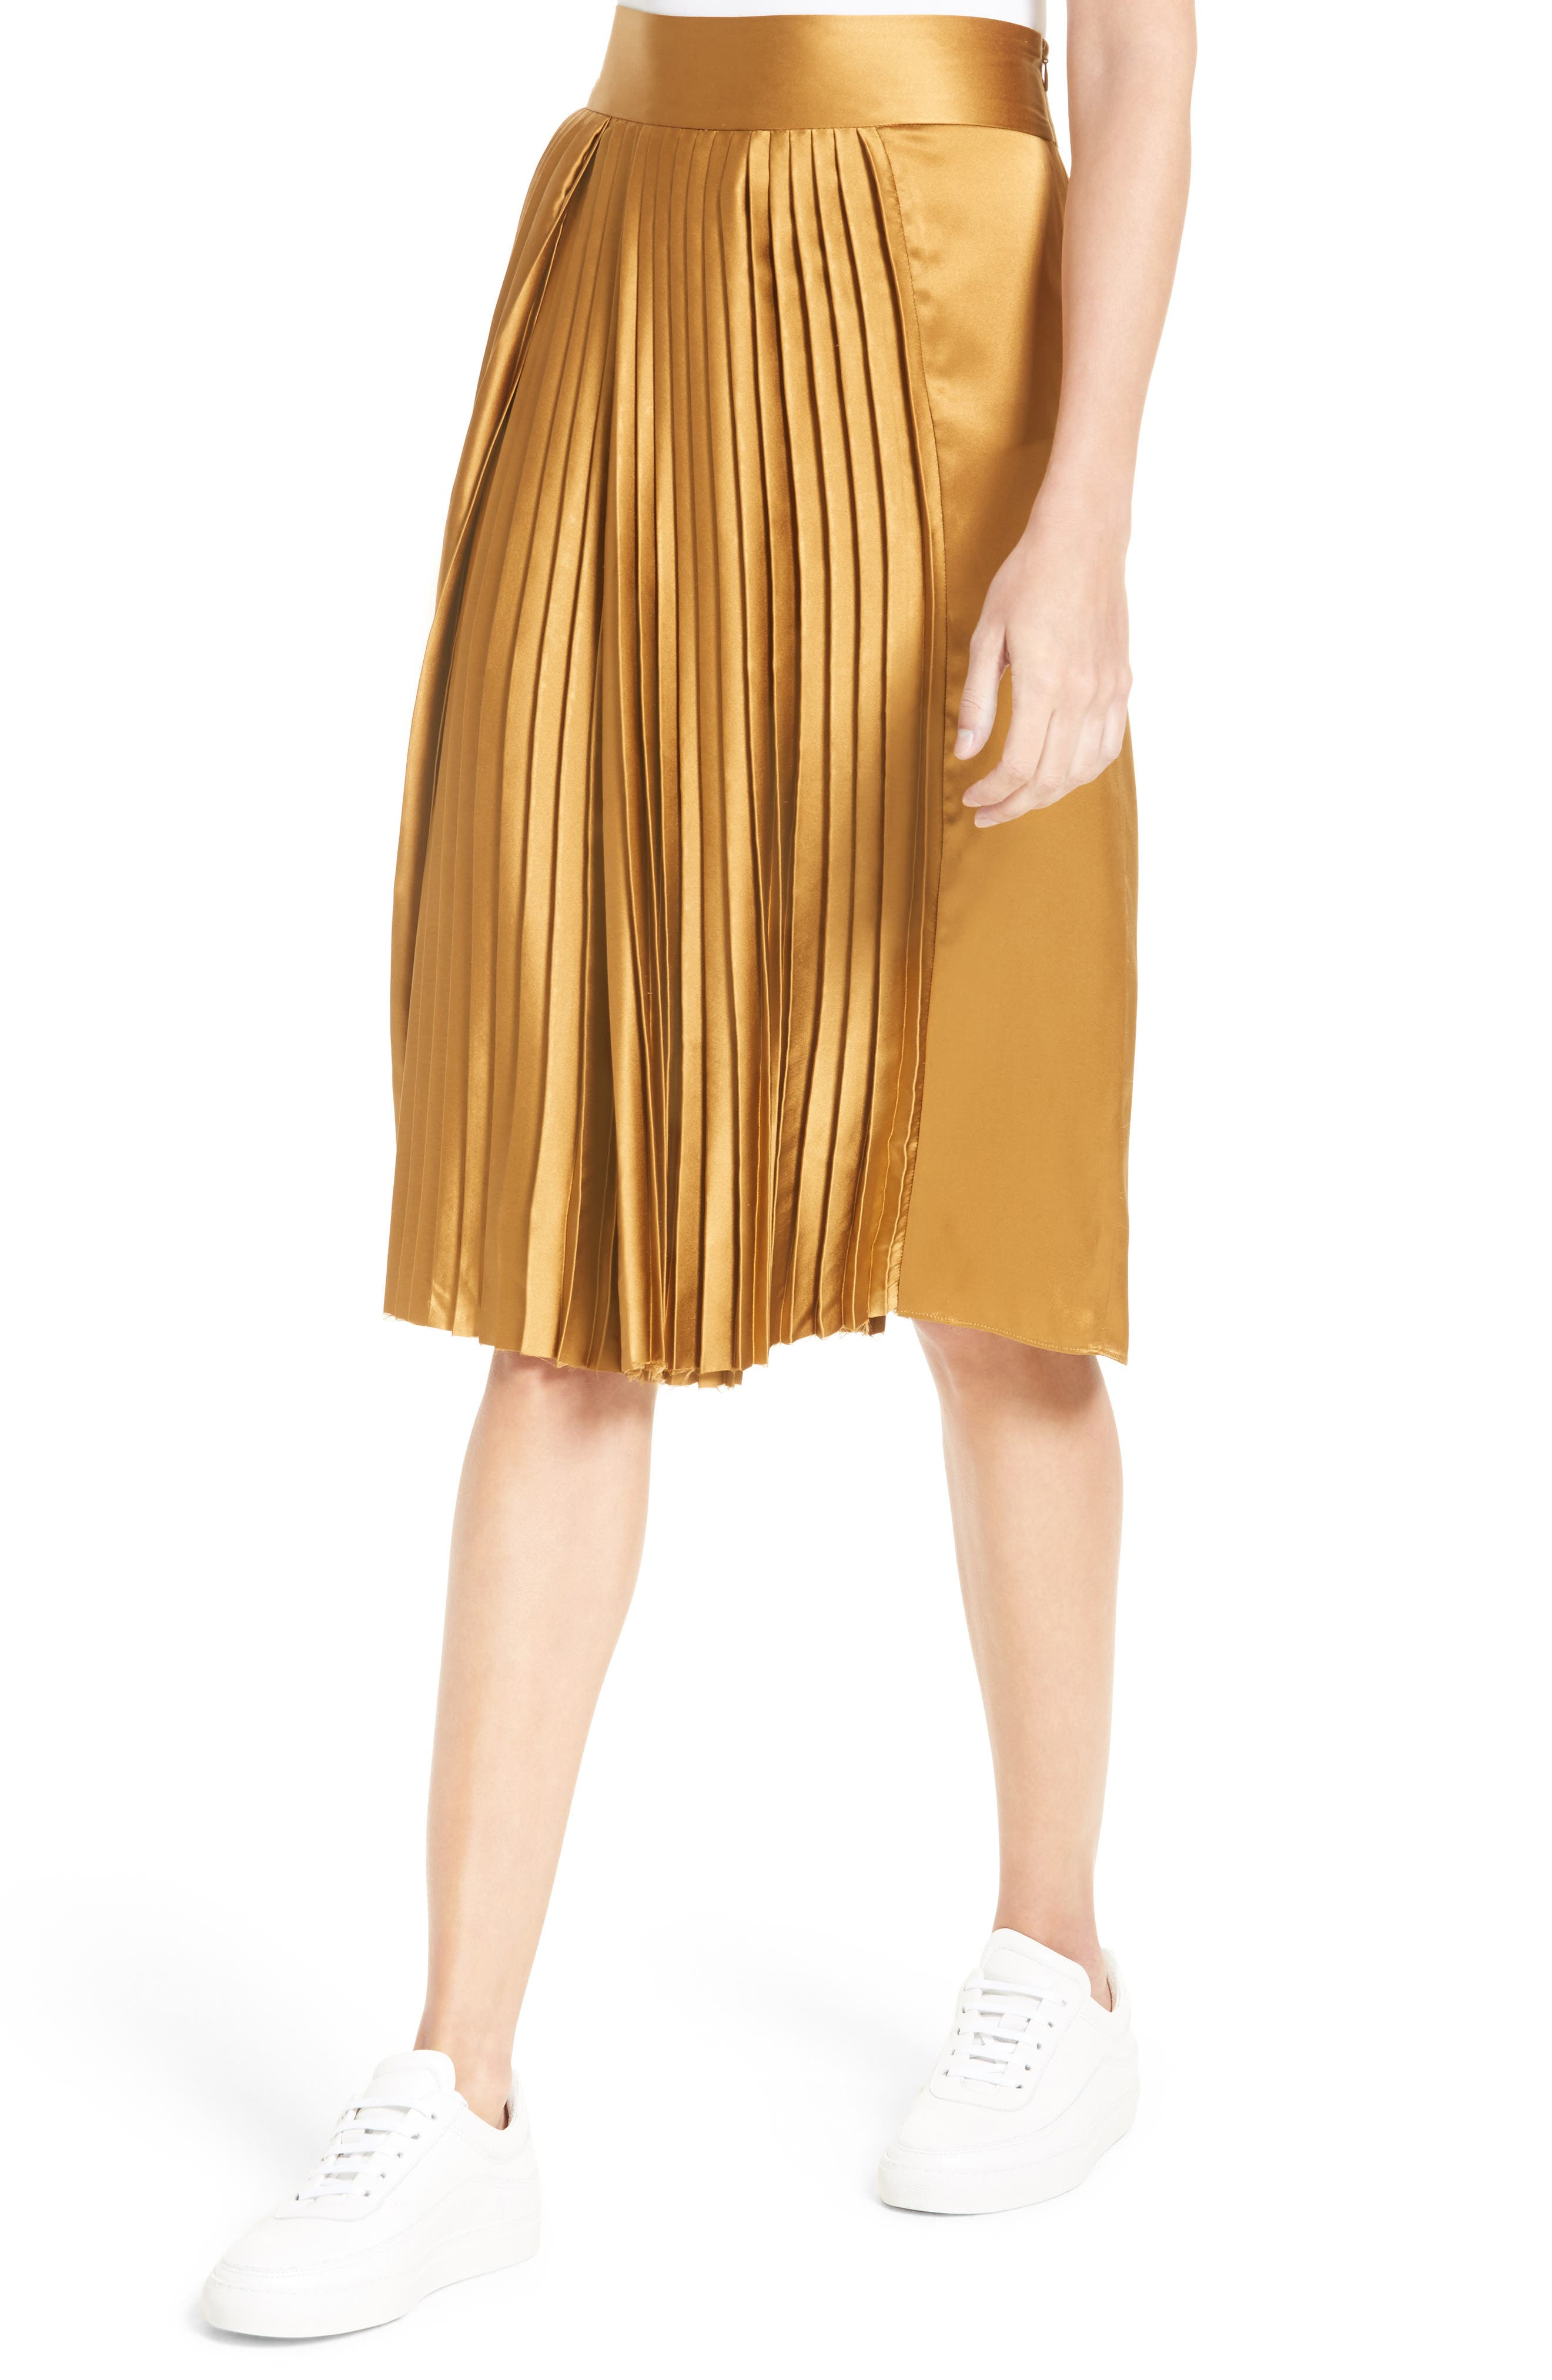 PUBLIC SCHOOL,                             Gamil Pleated Silk Skirt,                             Alternate thumbnail 4, color,                             200